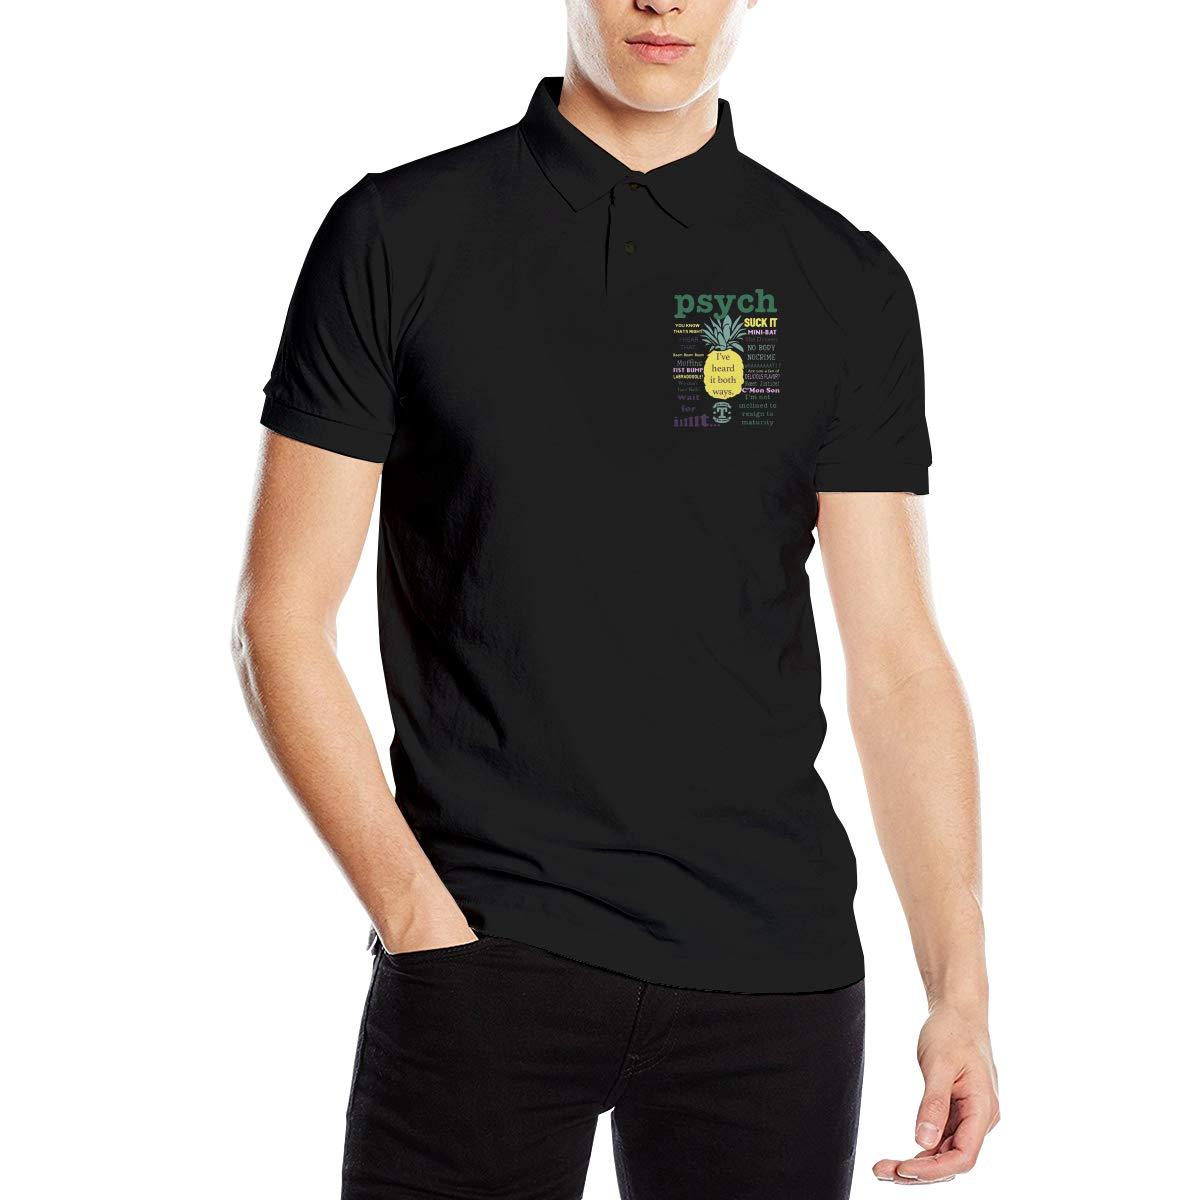 Arilce Psych?Suck?It?Pineapple?Delicious?Sunny Men Polo Shirt Short Sleeve Lapel Blouse Black